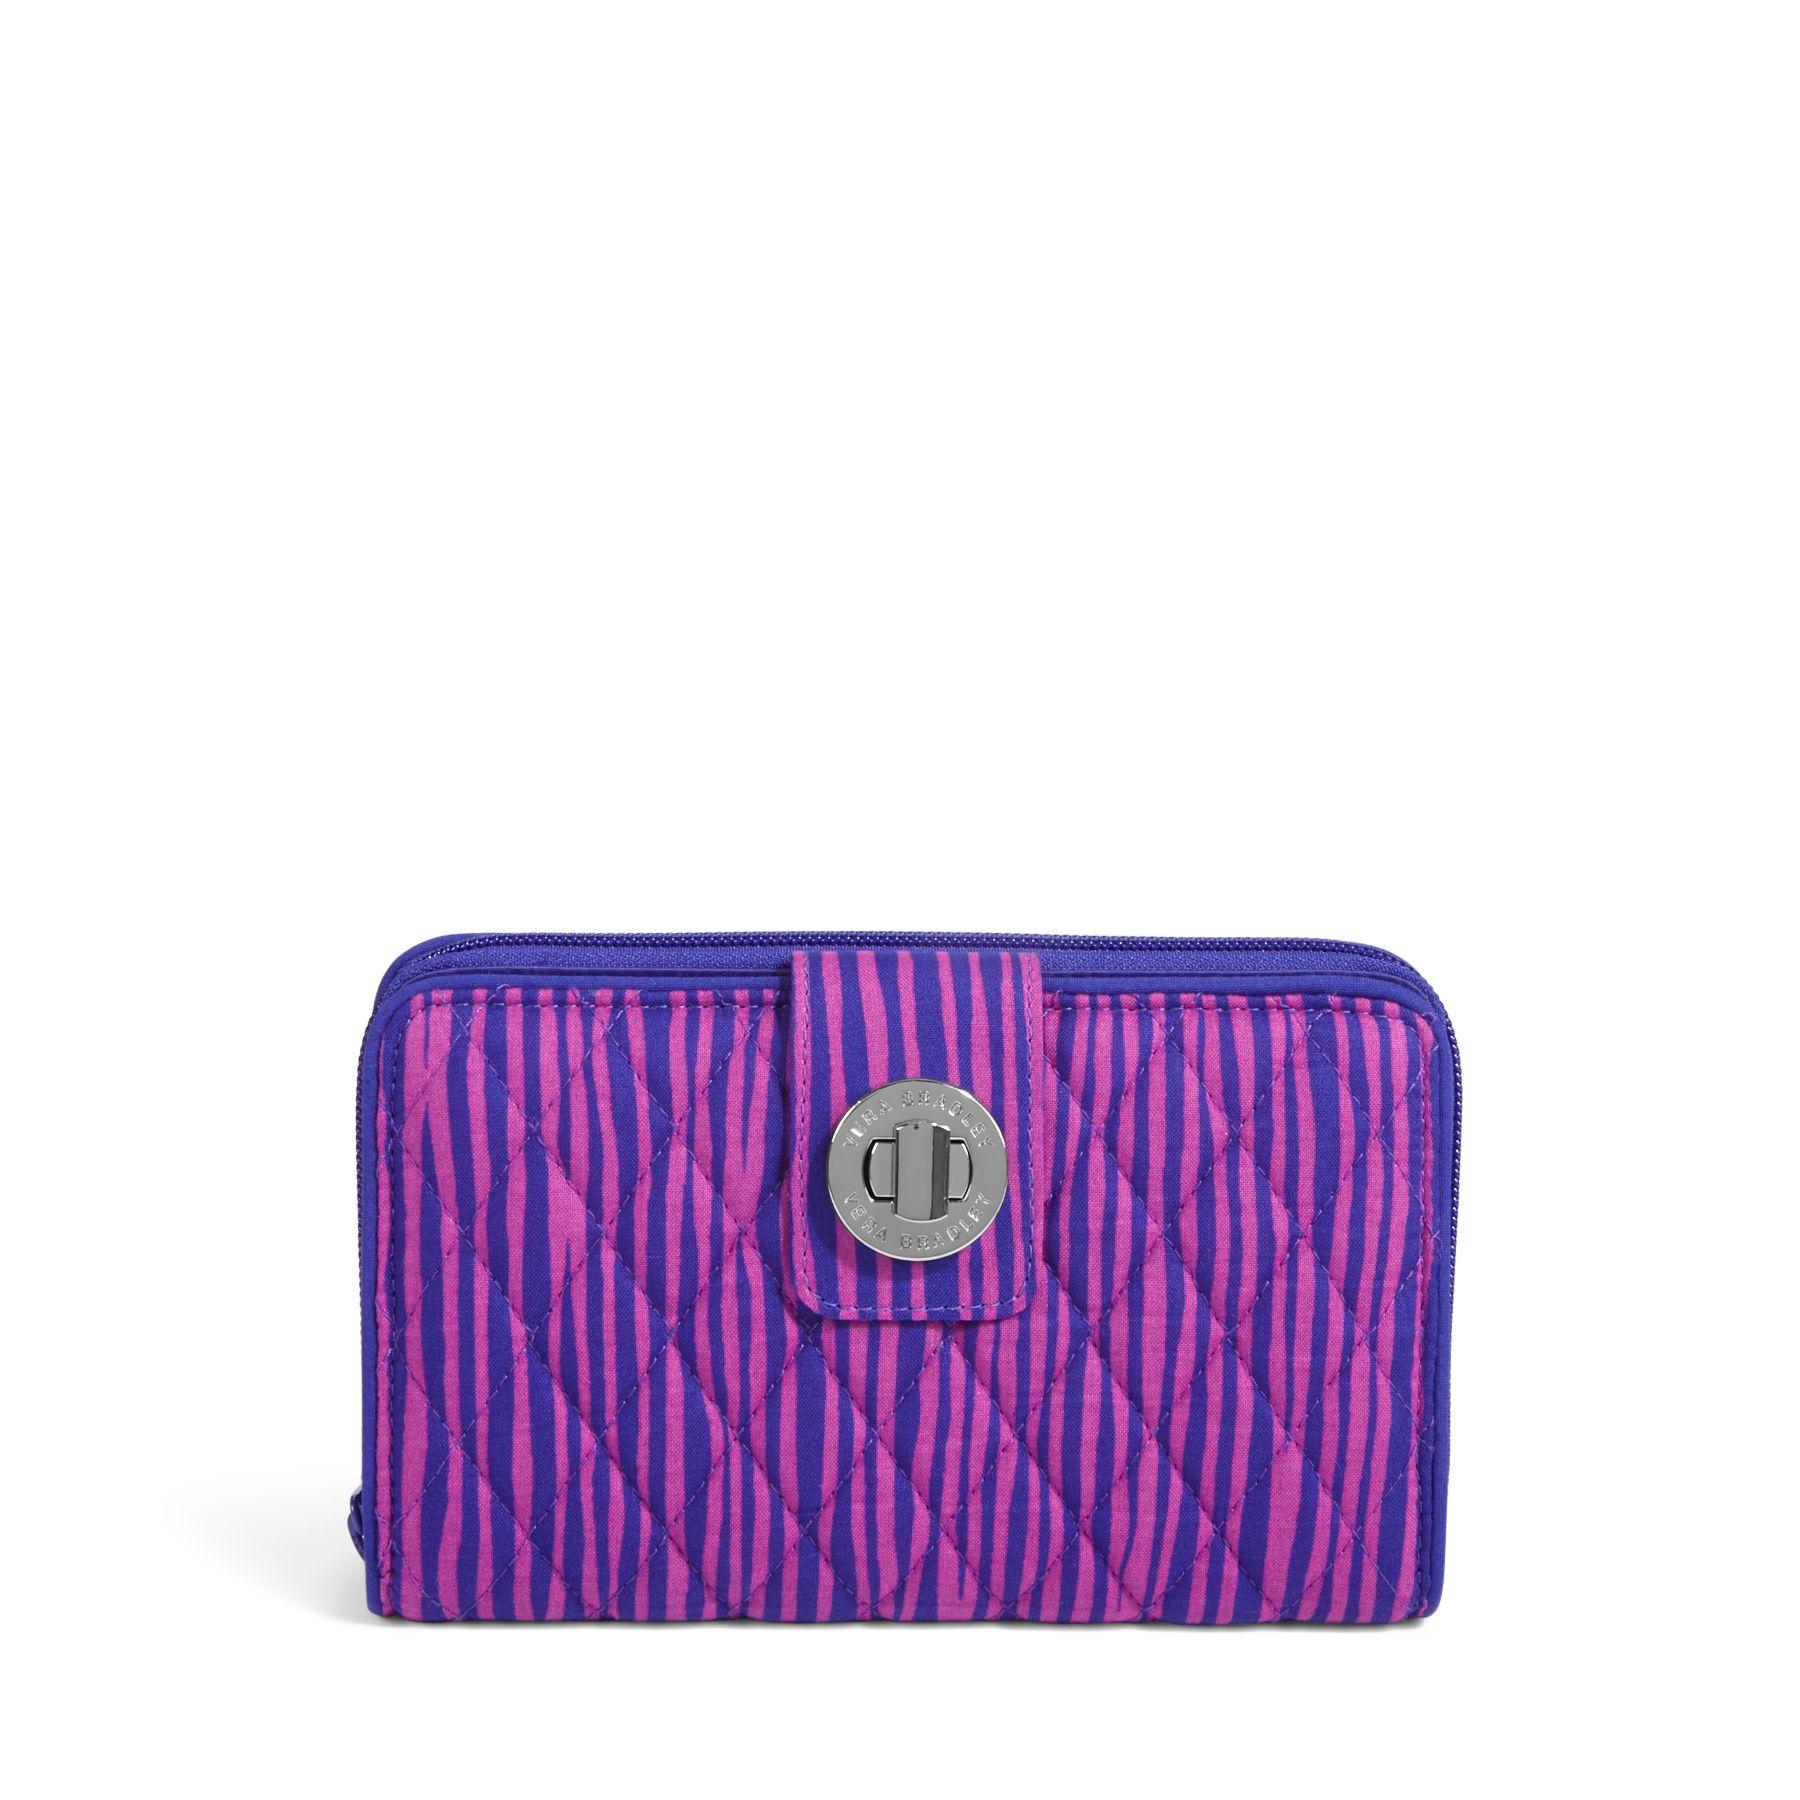 how to clean vera bradley wallet